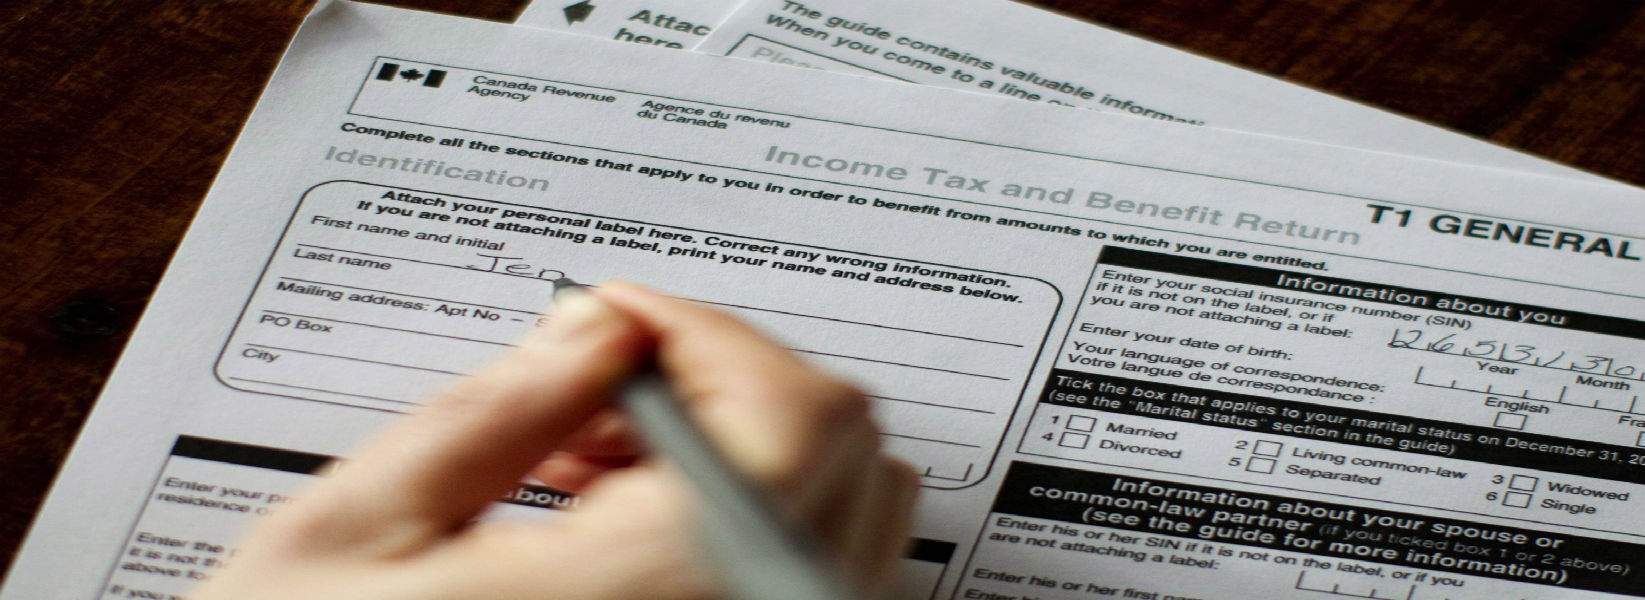 personal-income-tax-return-in-calgary